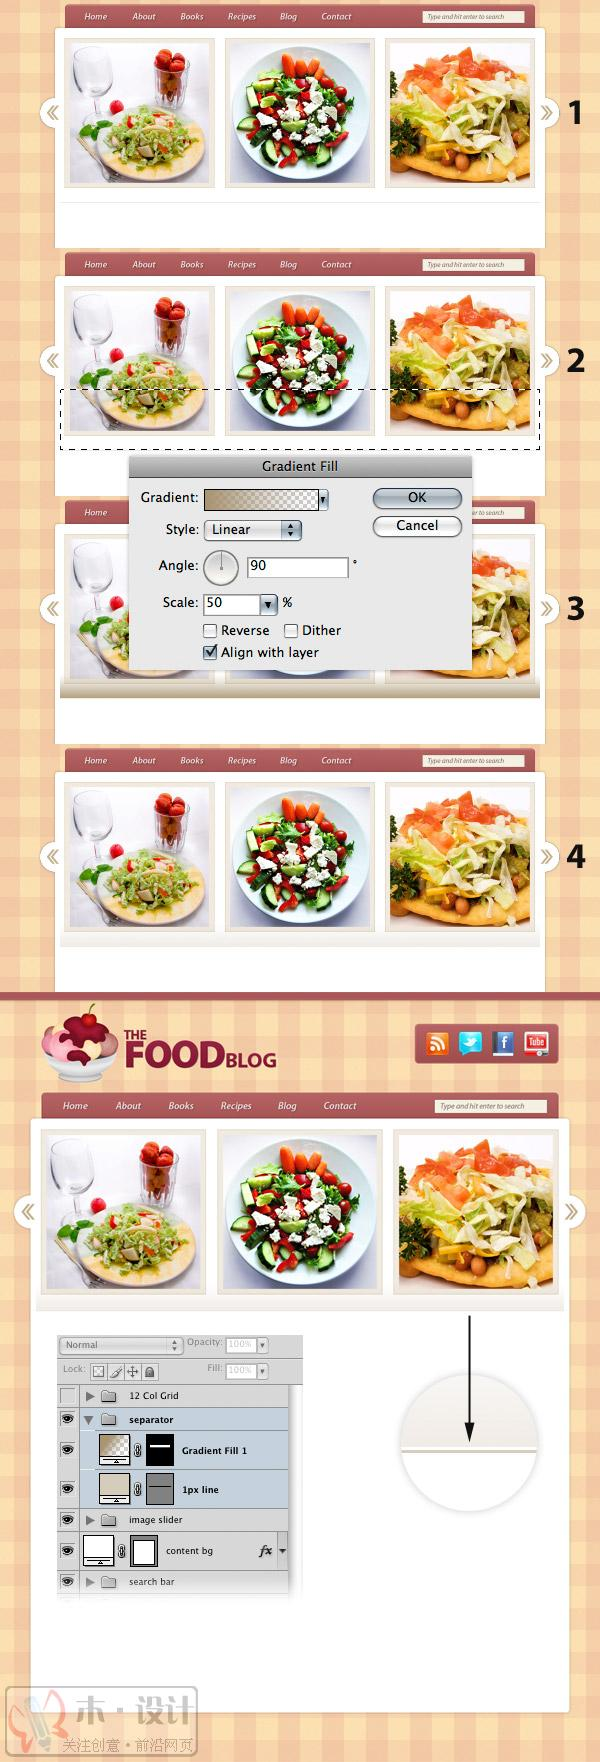 photoshop设计制作居家风格美食blog网页效果教程(下)